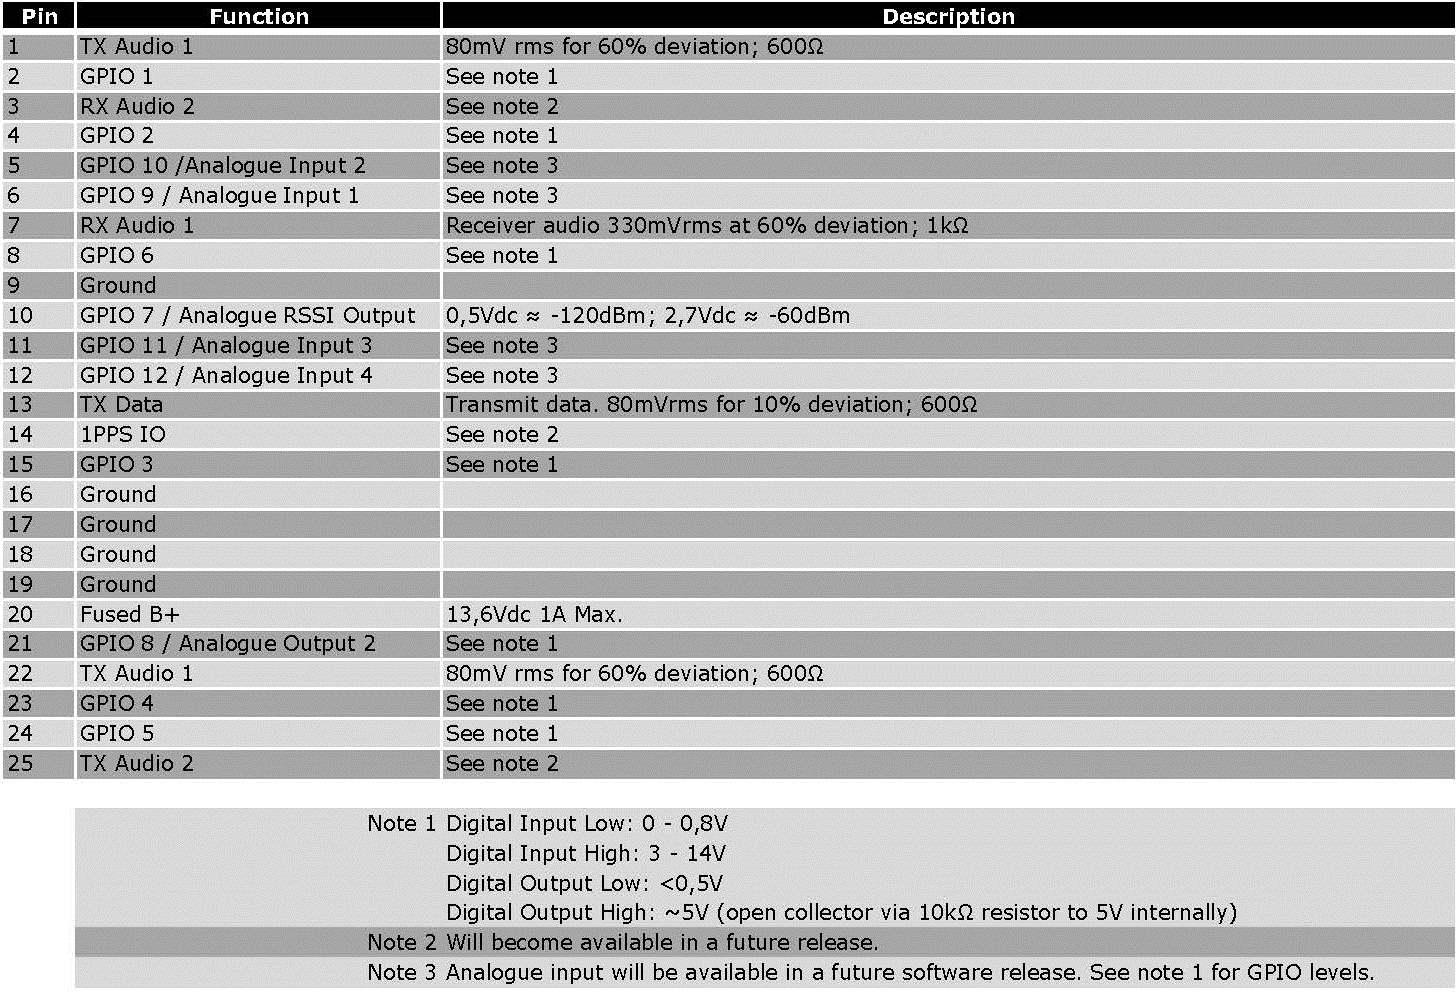 Programming DMR Repeater - N6PET - My Ham Radio Journal